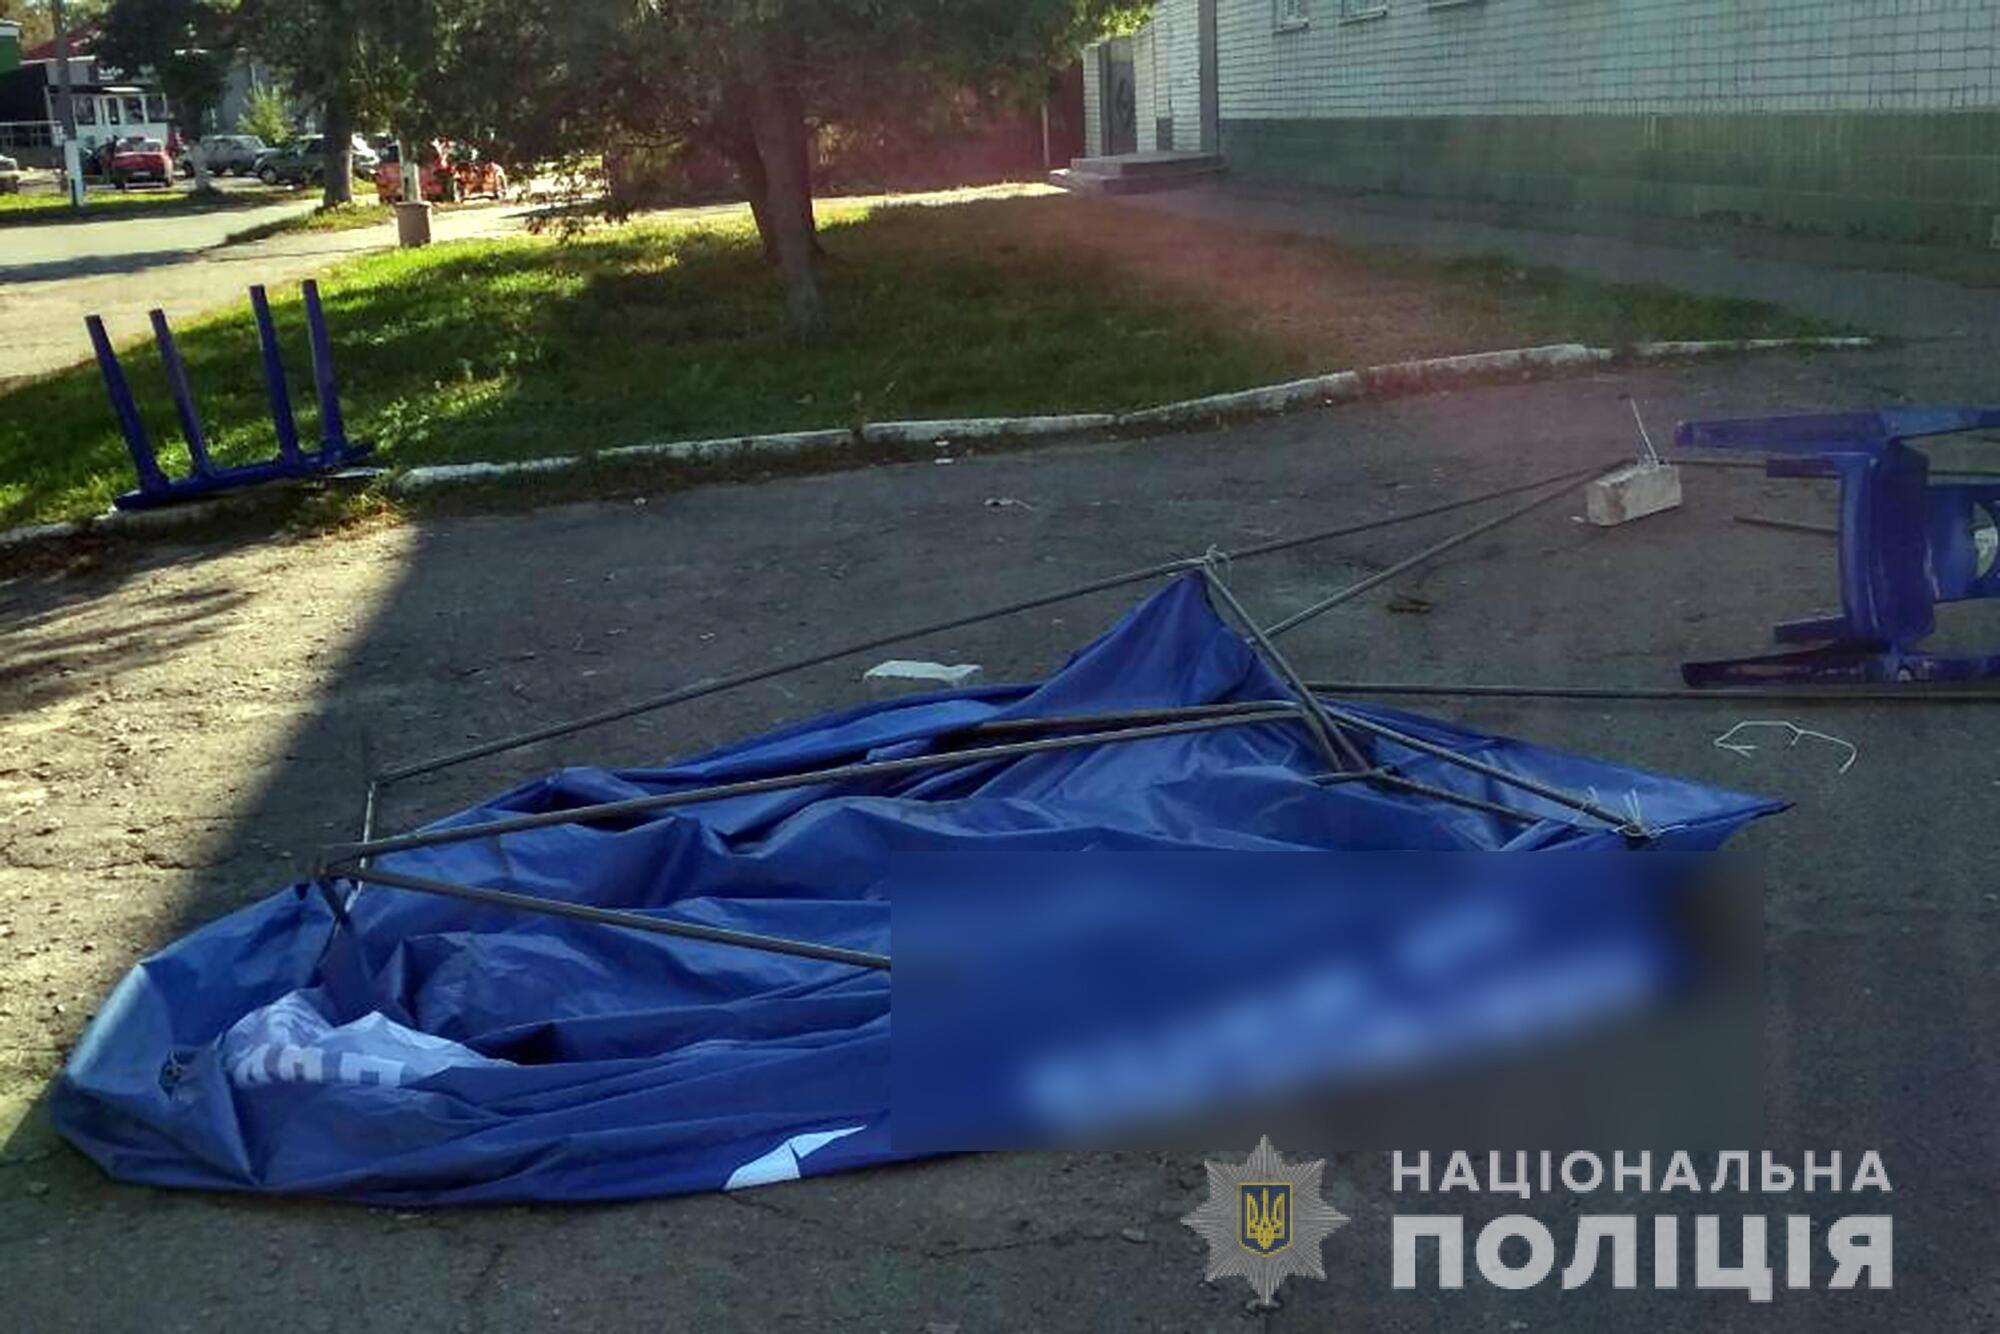 Инцидент произошел в городе Бобровица.